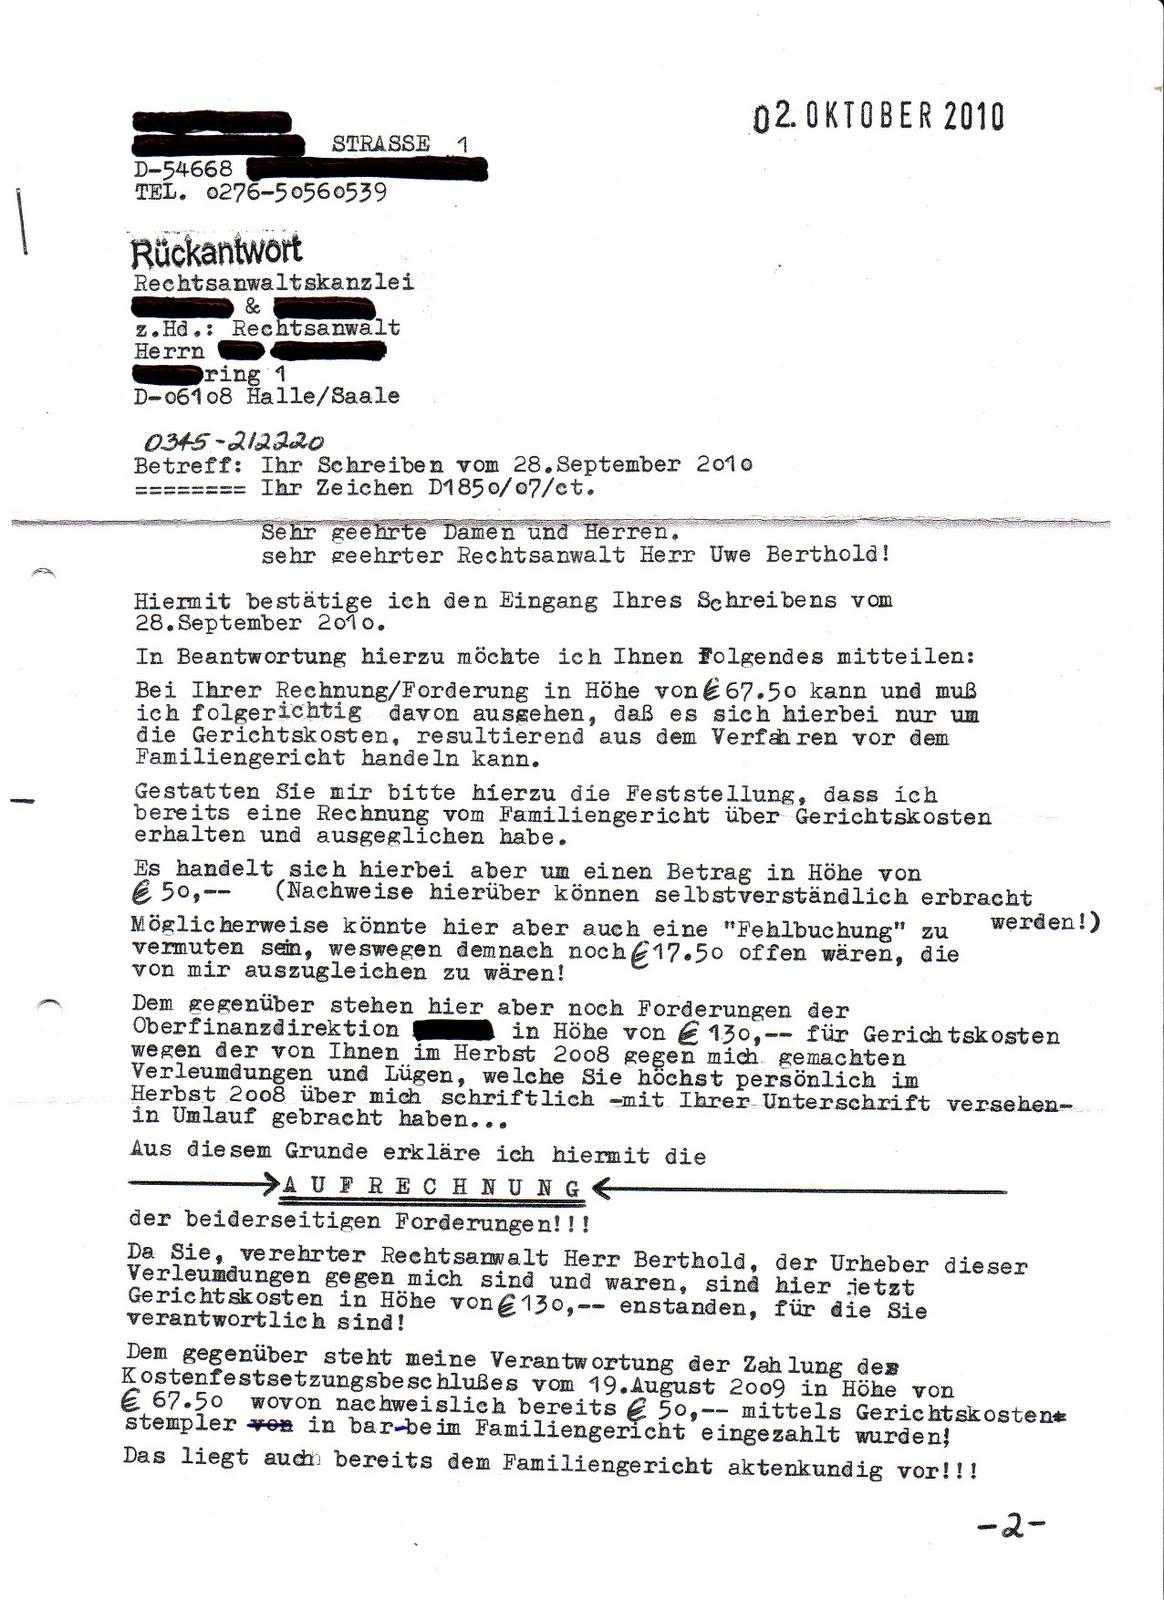 Rechtsanwaltskanzlei-Halle-Saale-Hansering-1